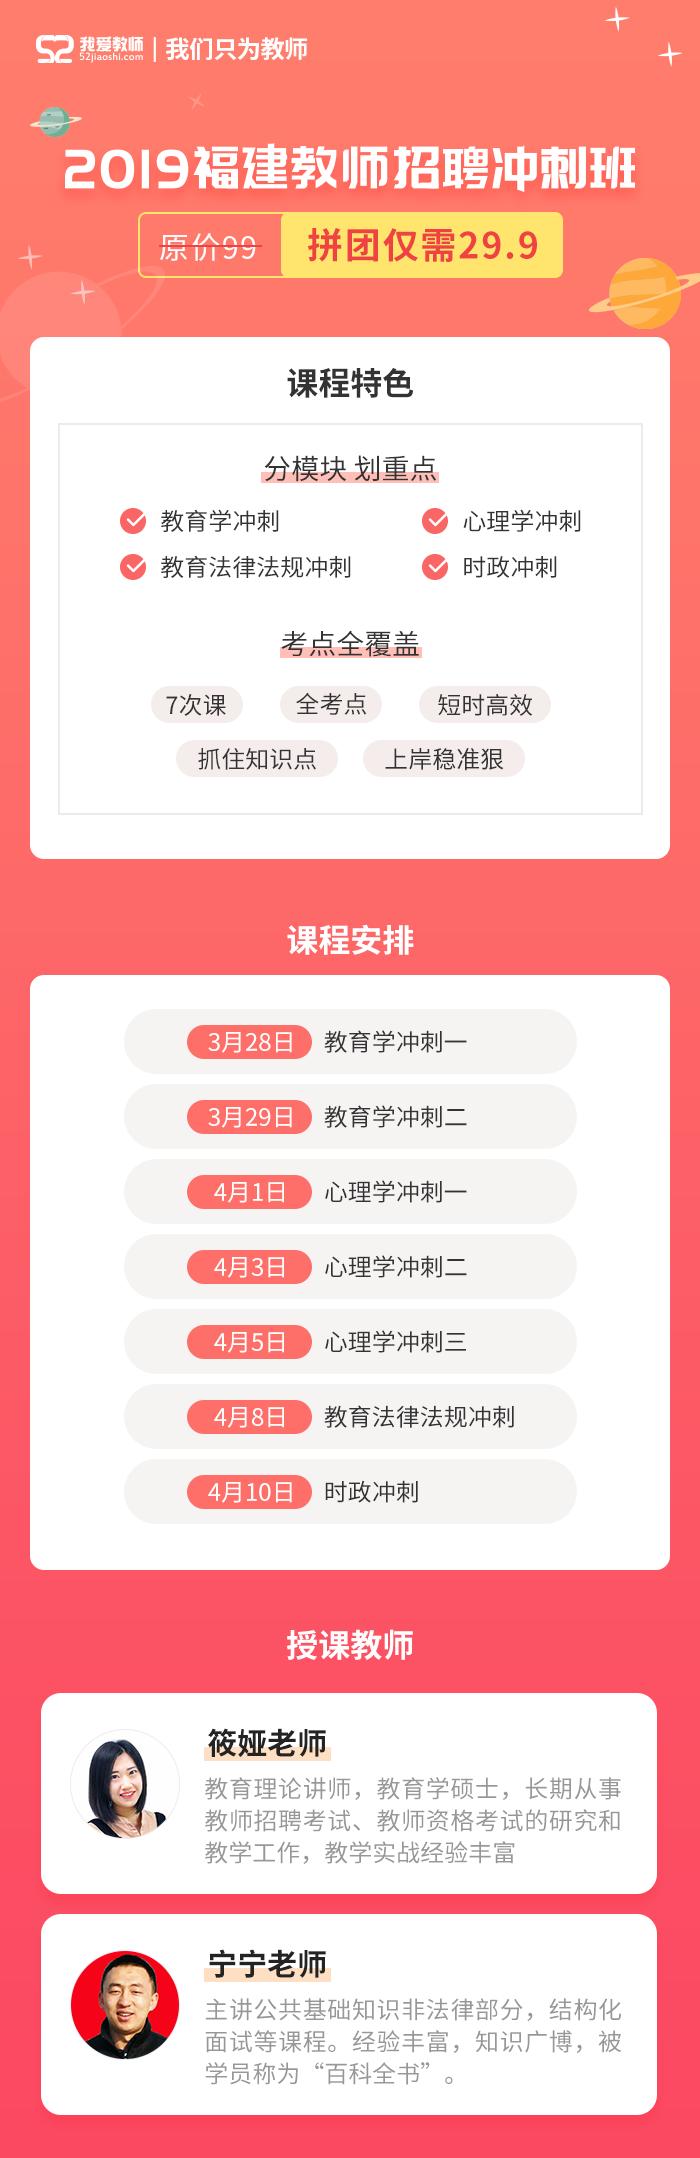 福建冲刺班.png